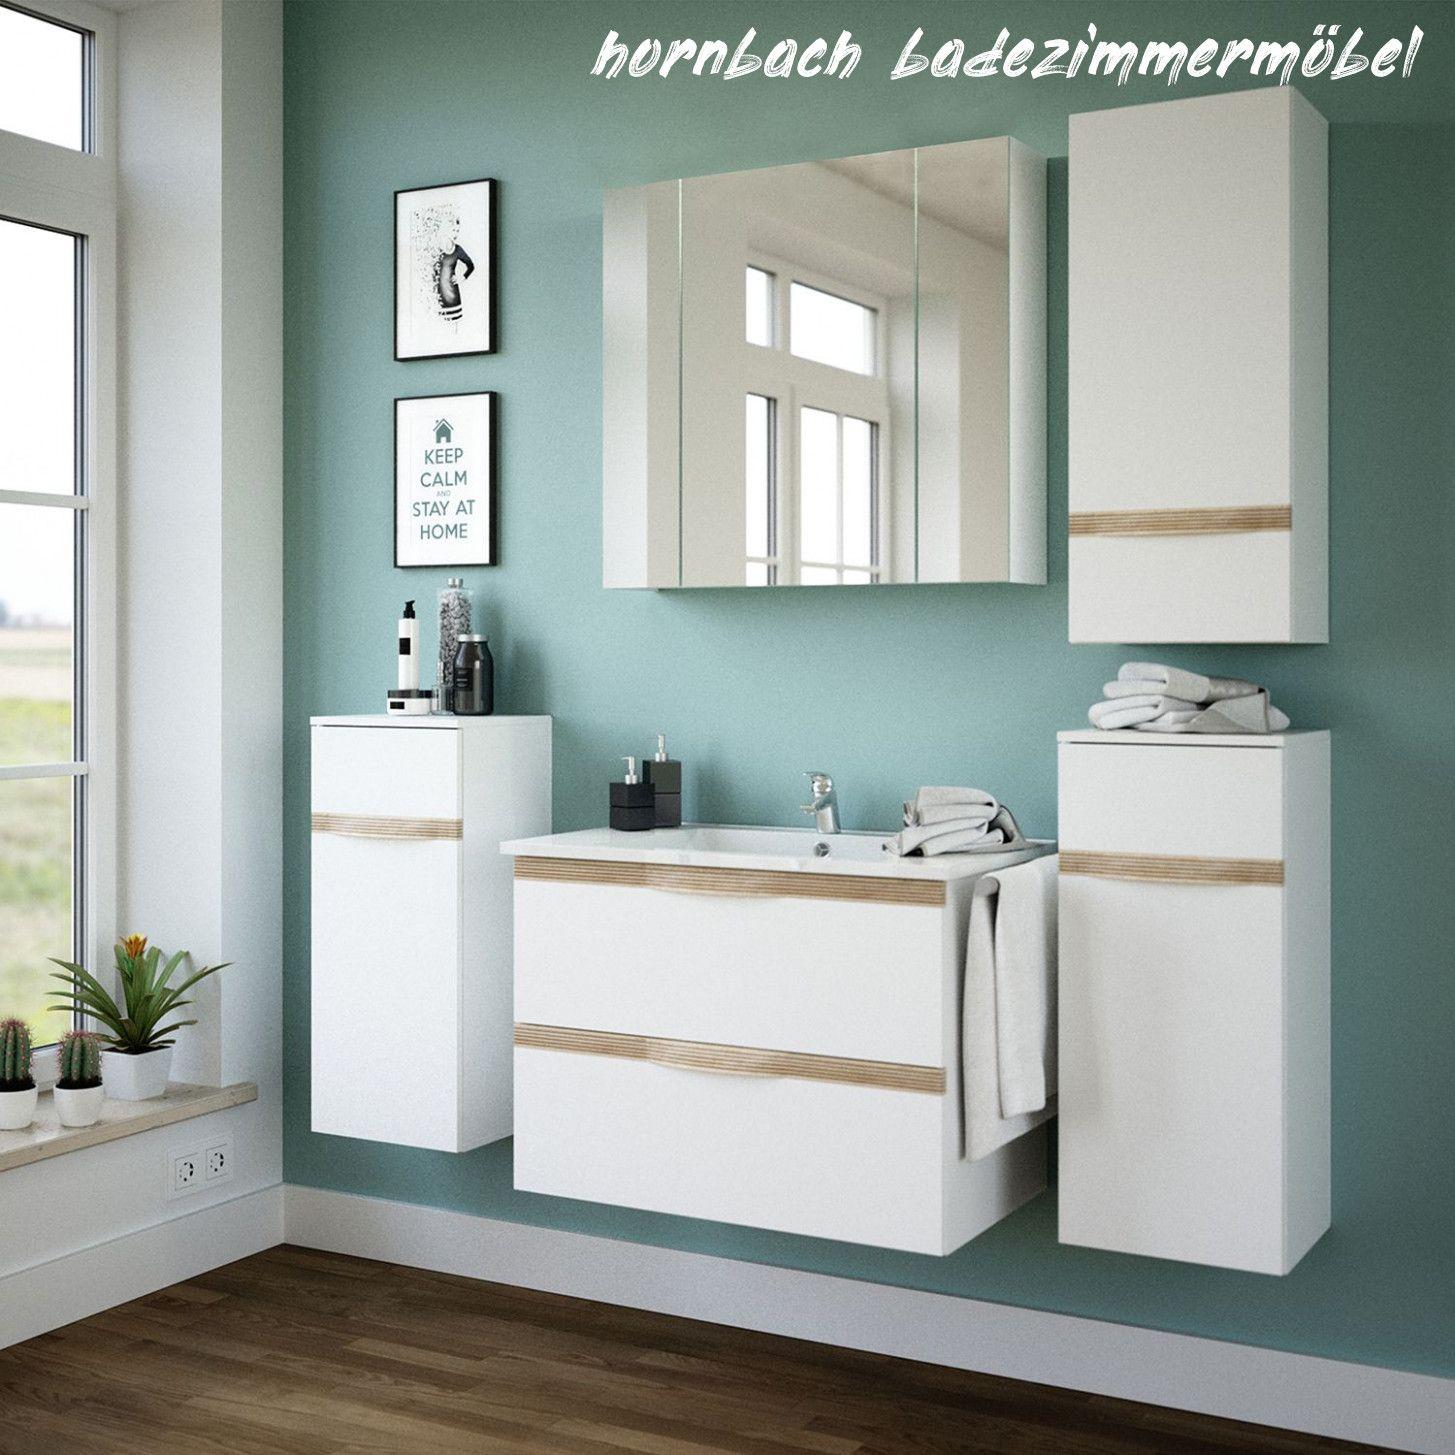 11 Hornbach Badezimmermobel In 2020 New Homes Bathroom Decor Vanity